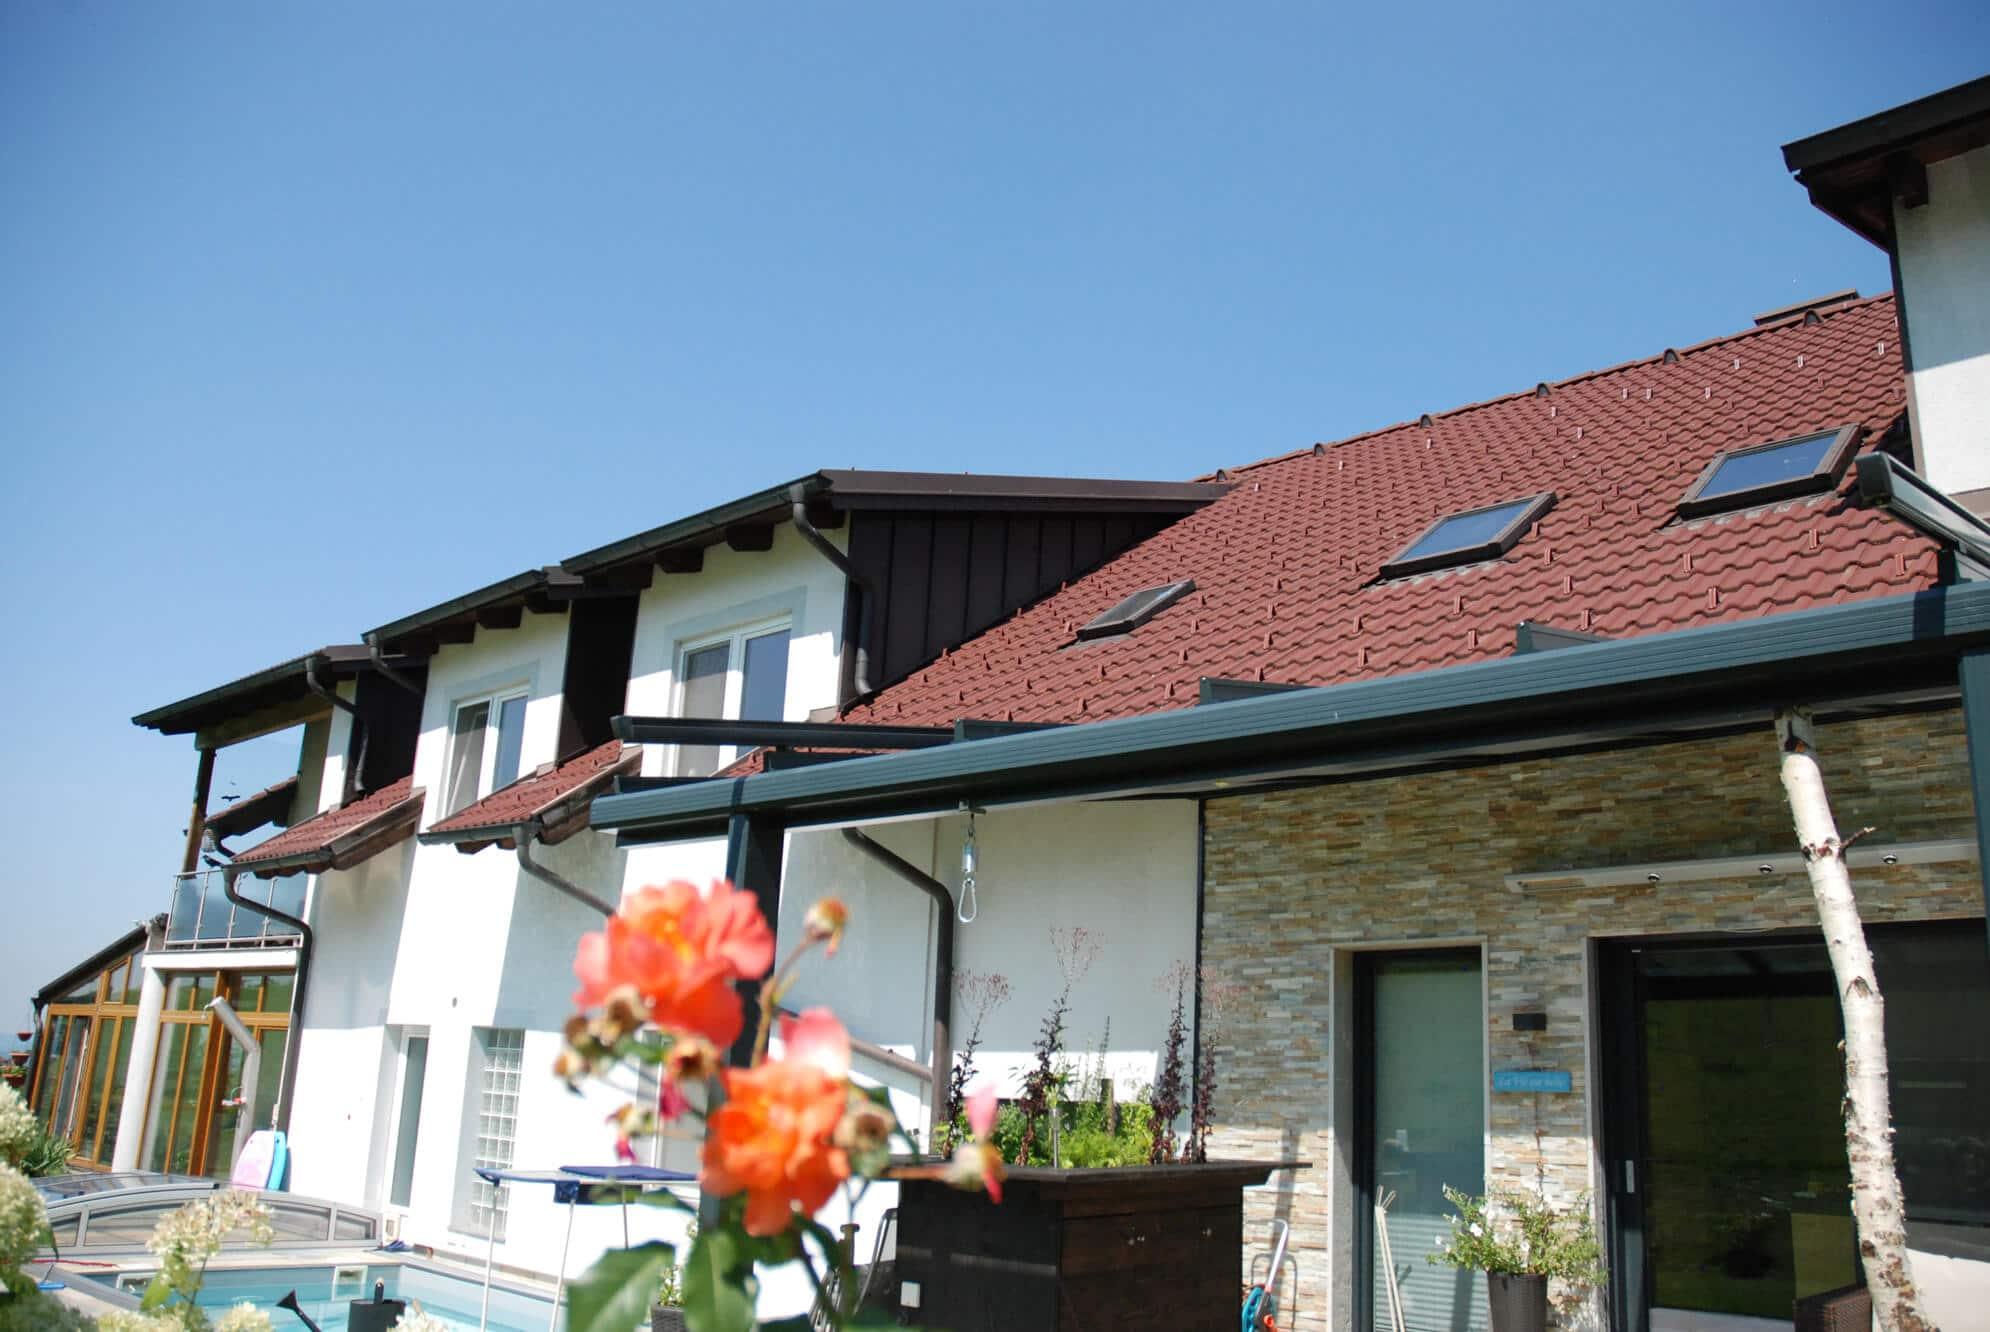 Terrassenüberdachung Alu Systeme mit VSG-Verglasung